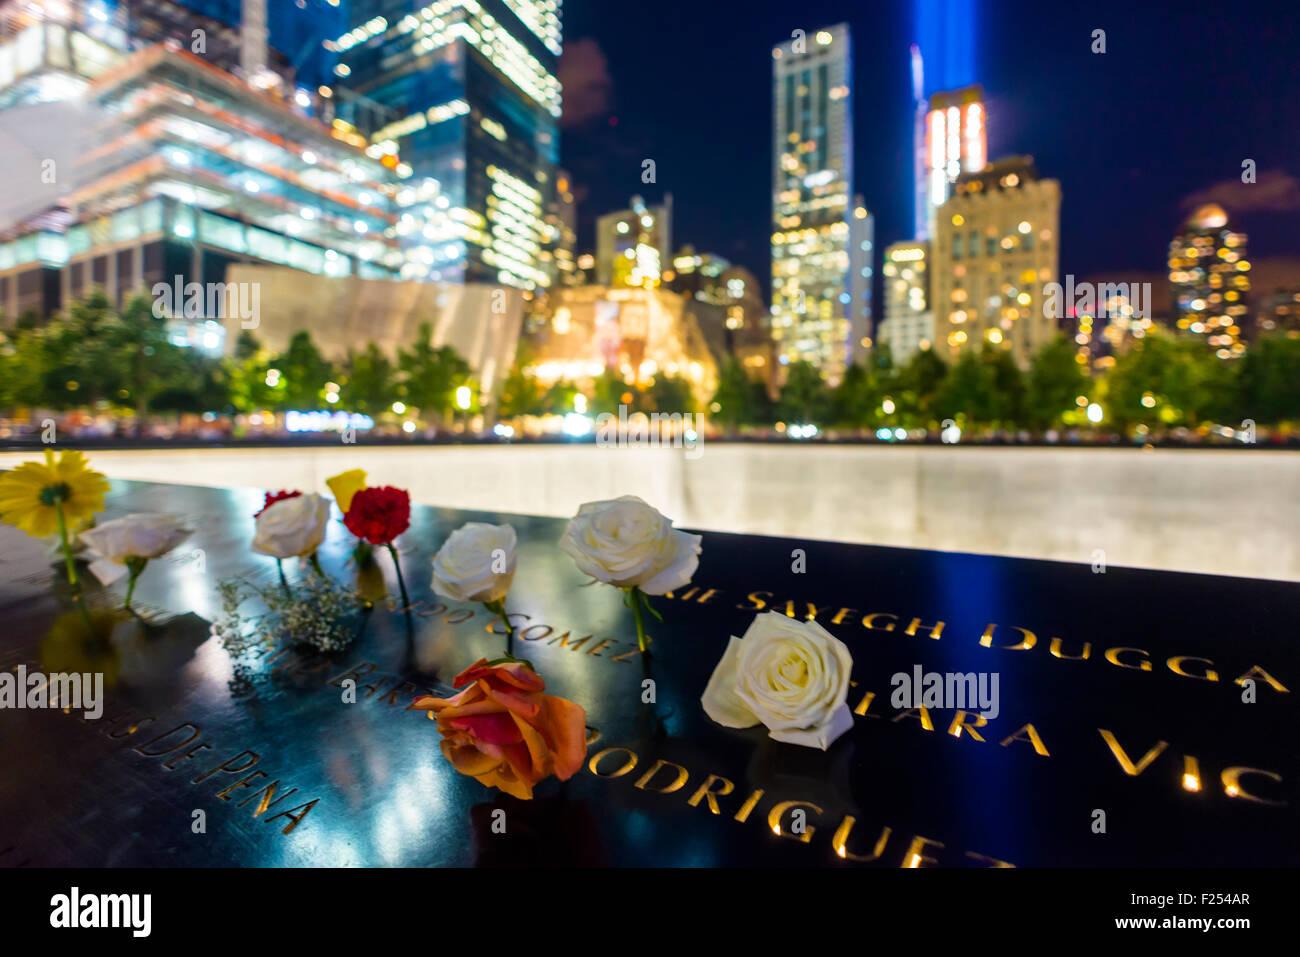 New York, NY - 11. September 2015 - Blumen umgeben den reflektierenden Pools im 911 Memorial and Museum am 13. Jahrestag Stockbild